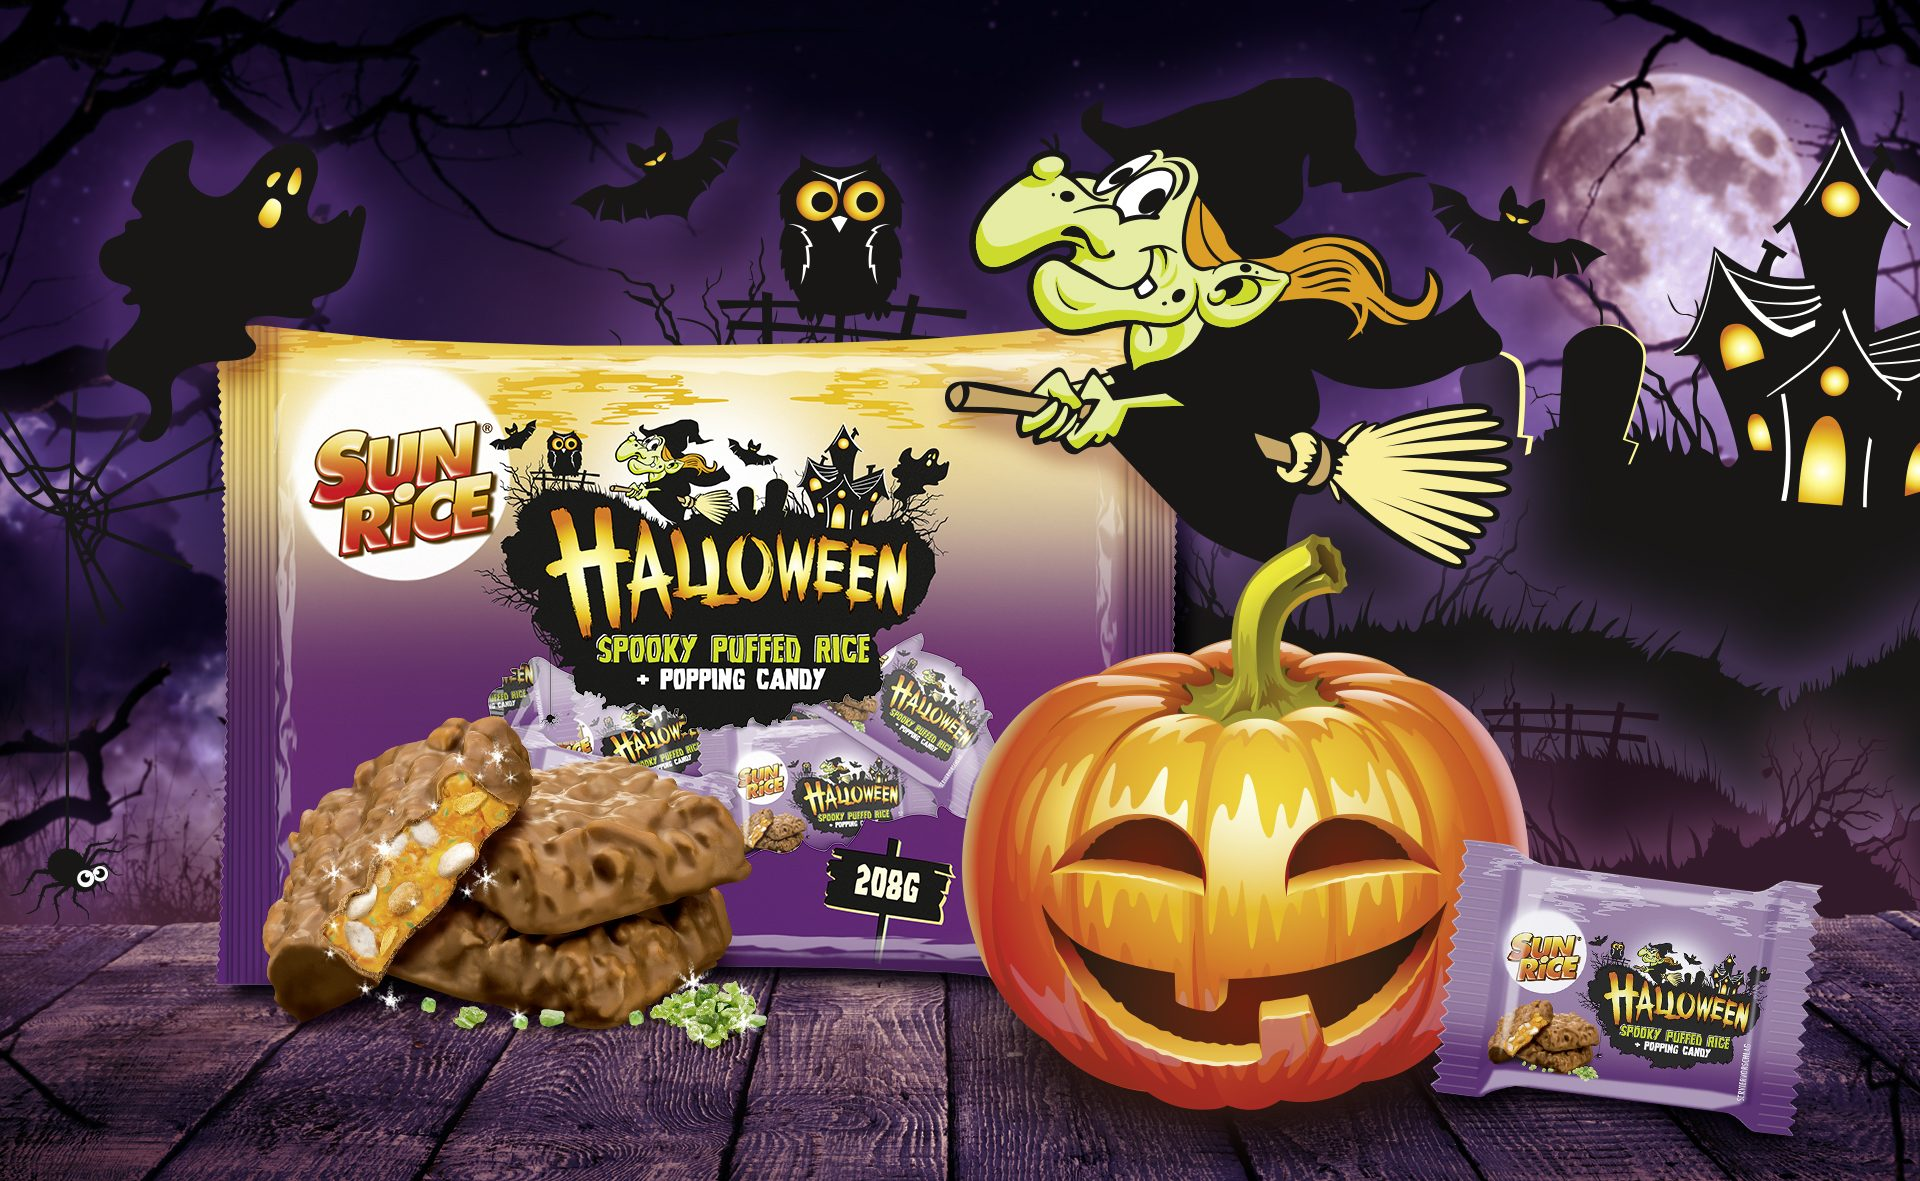 Verpackungsdesign Malvega - Referenz: SunRice Halloween, Aldi